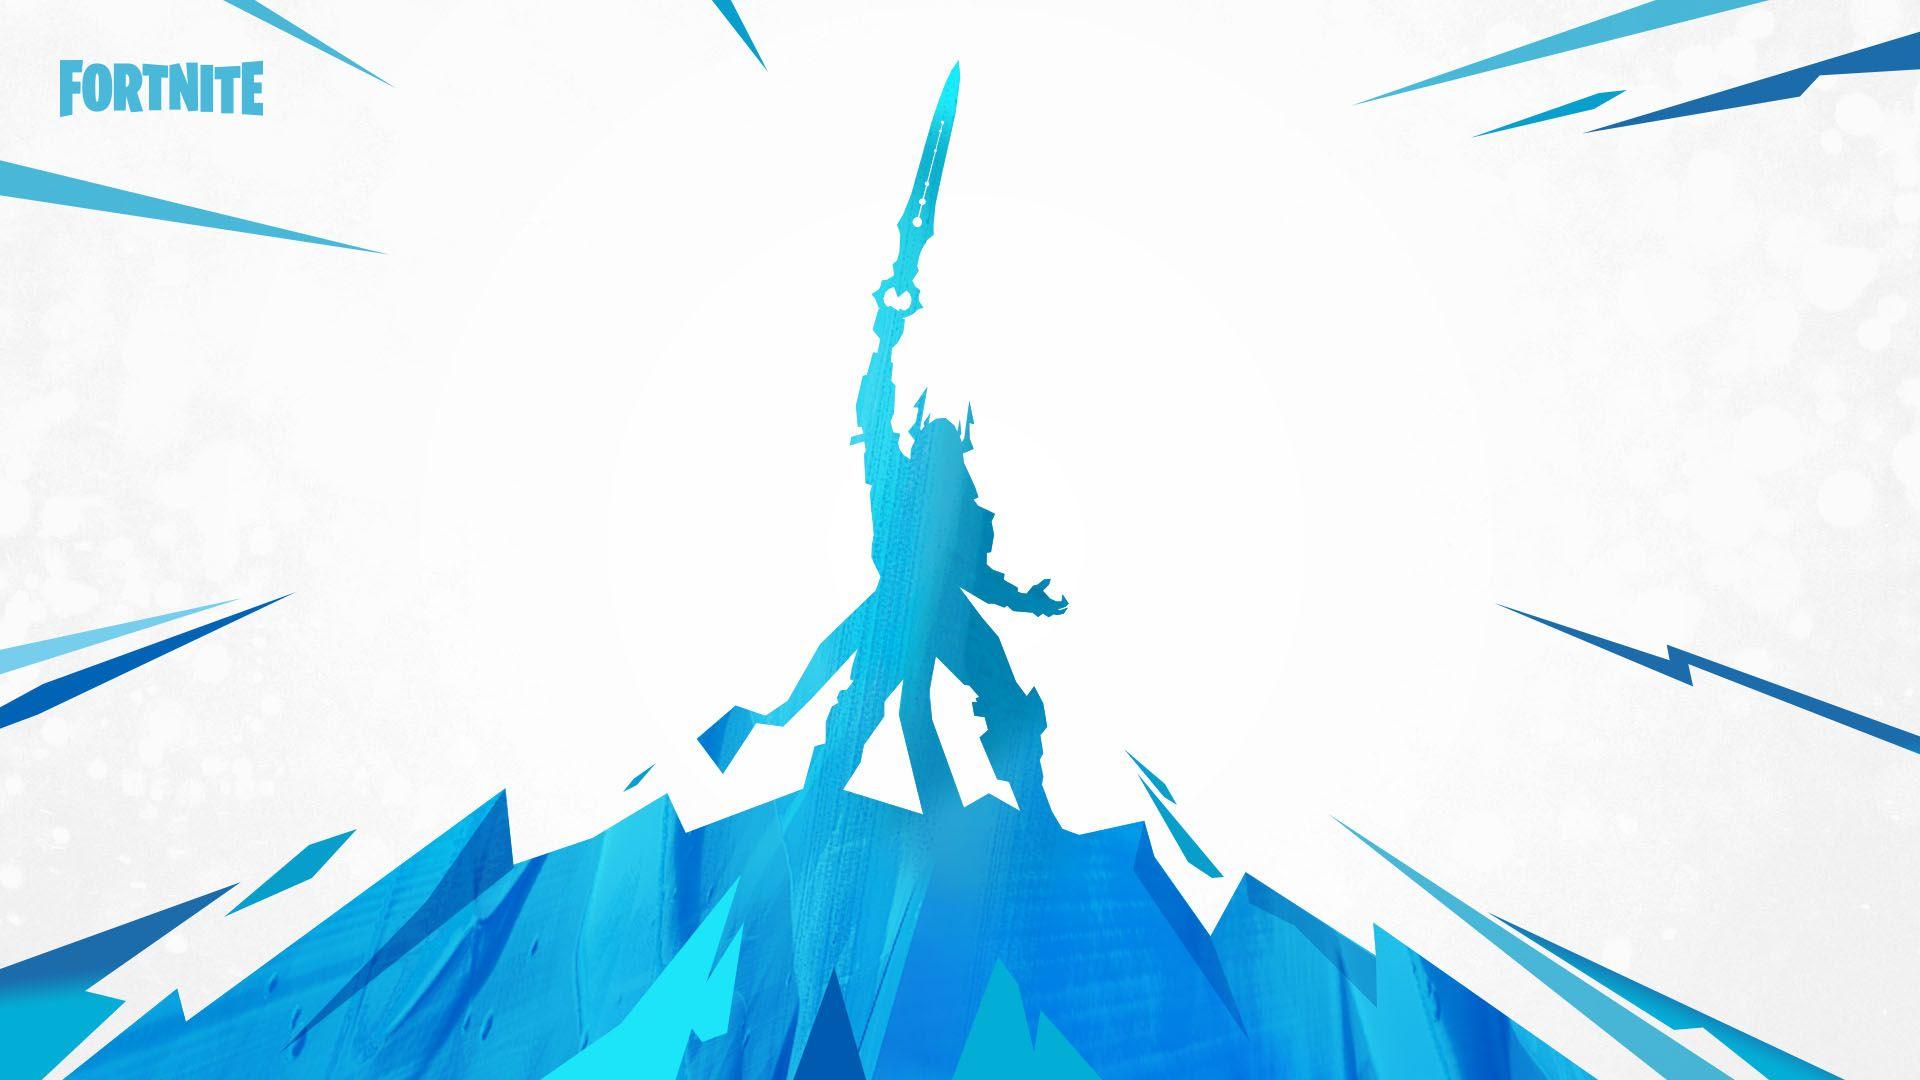 Fortnite Infinity Blade Kill race